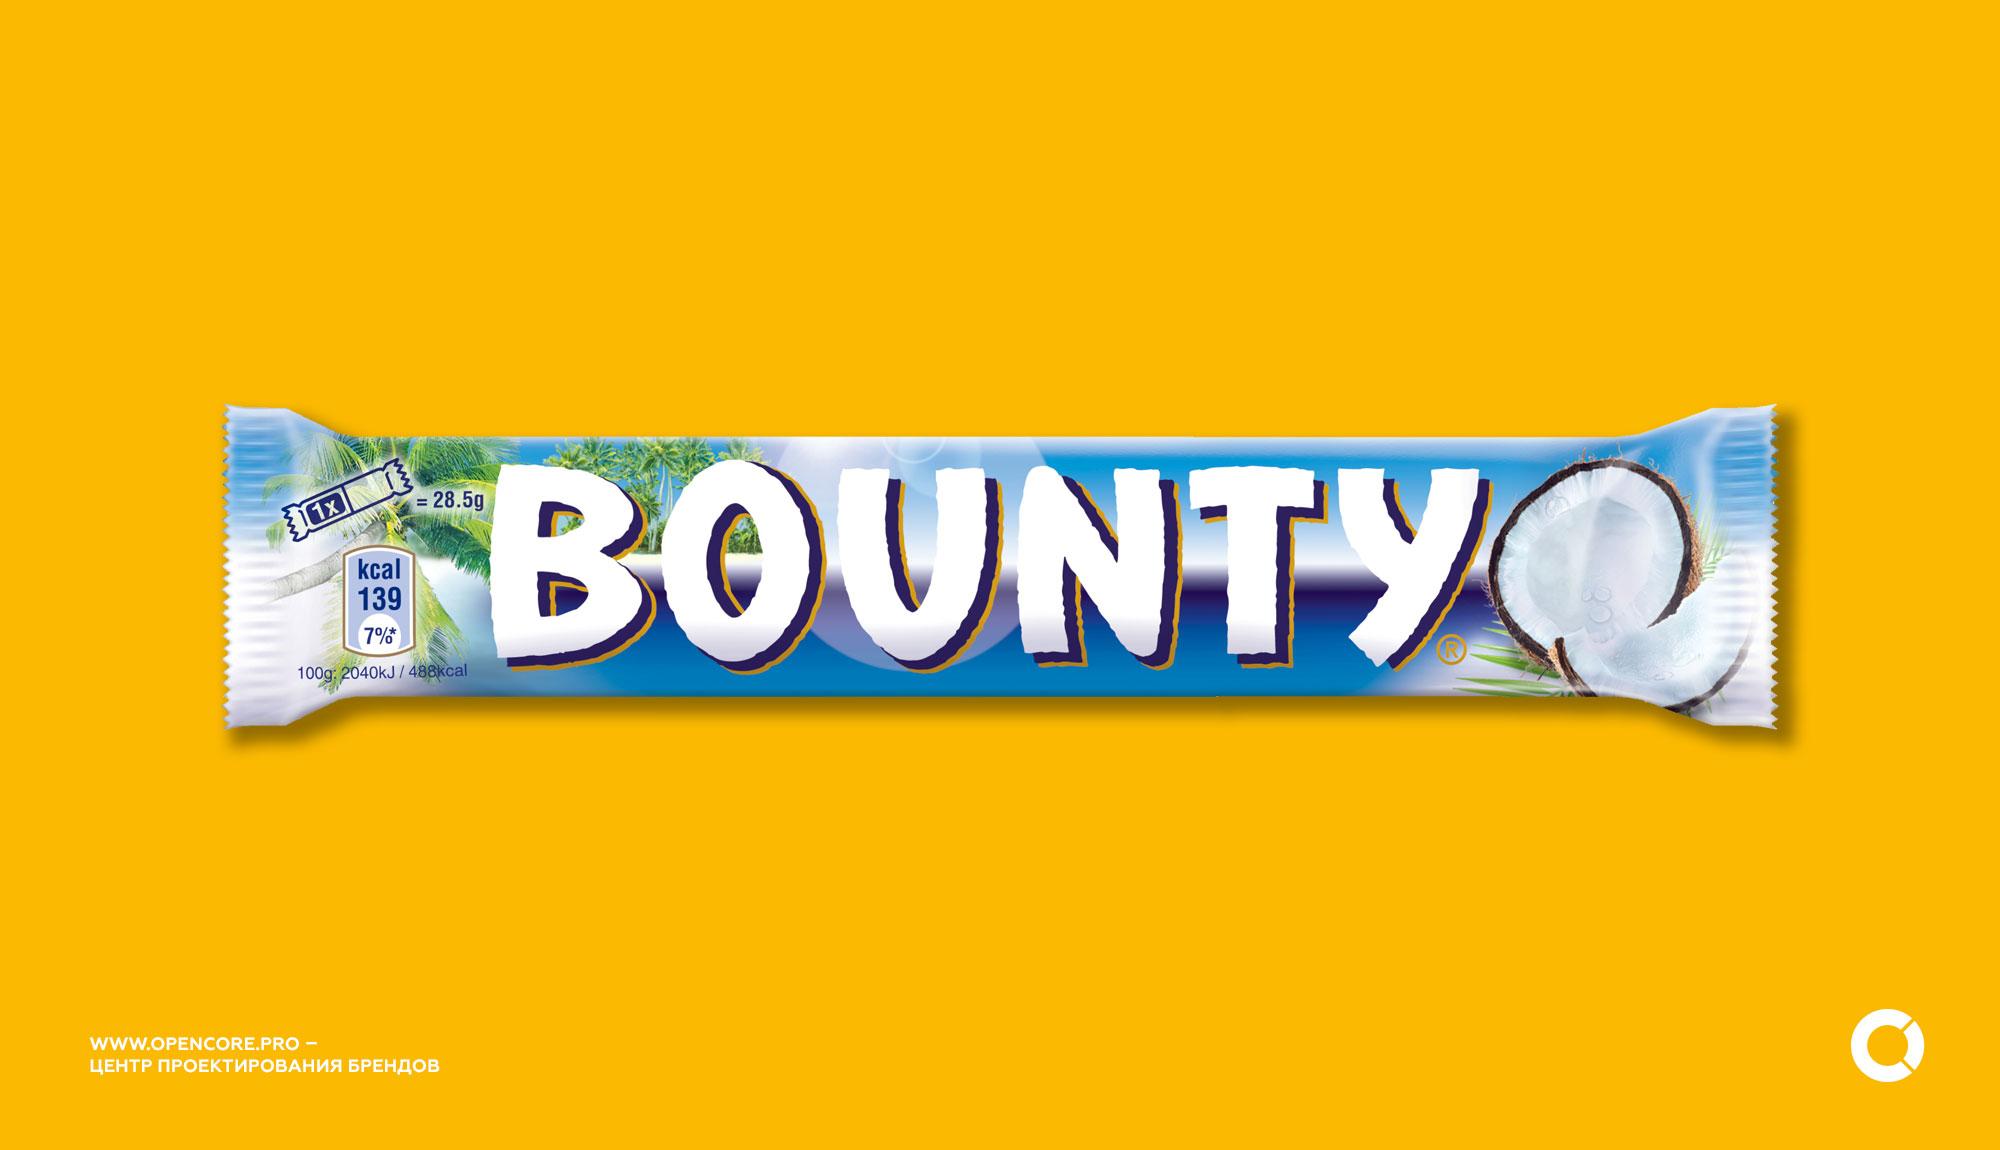 методология исследования бренда на примере Bounty